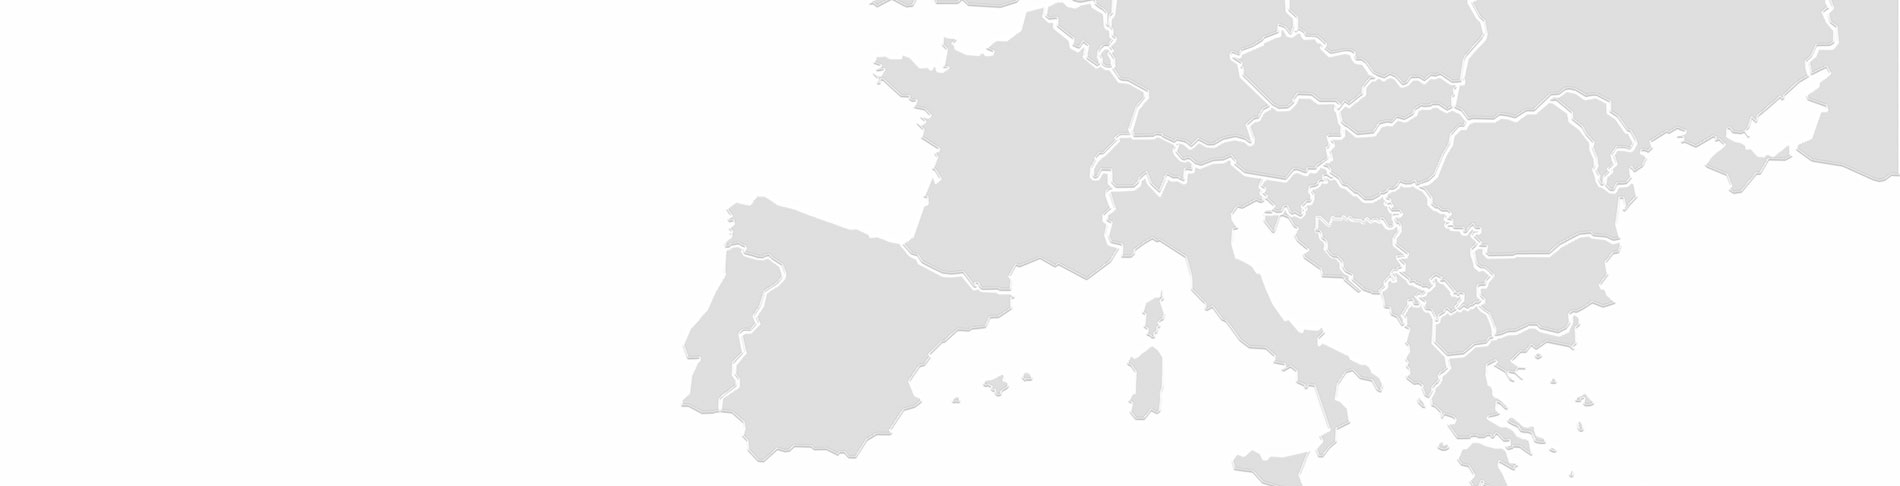 portugal_espanha.jpg